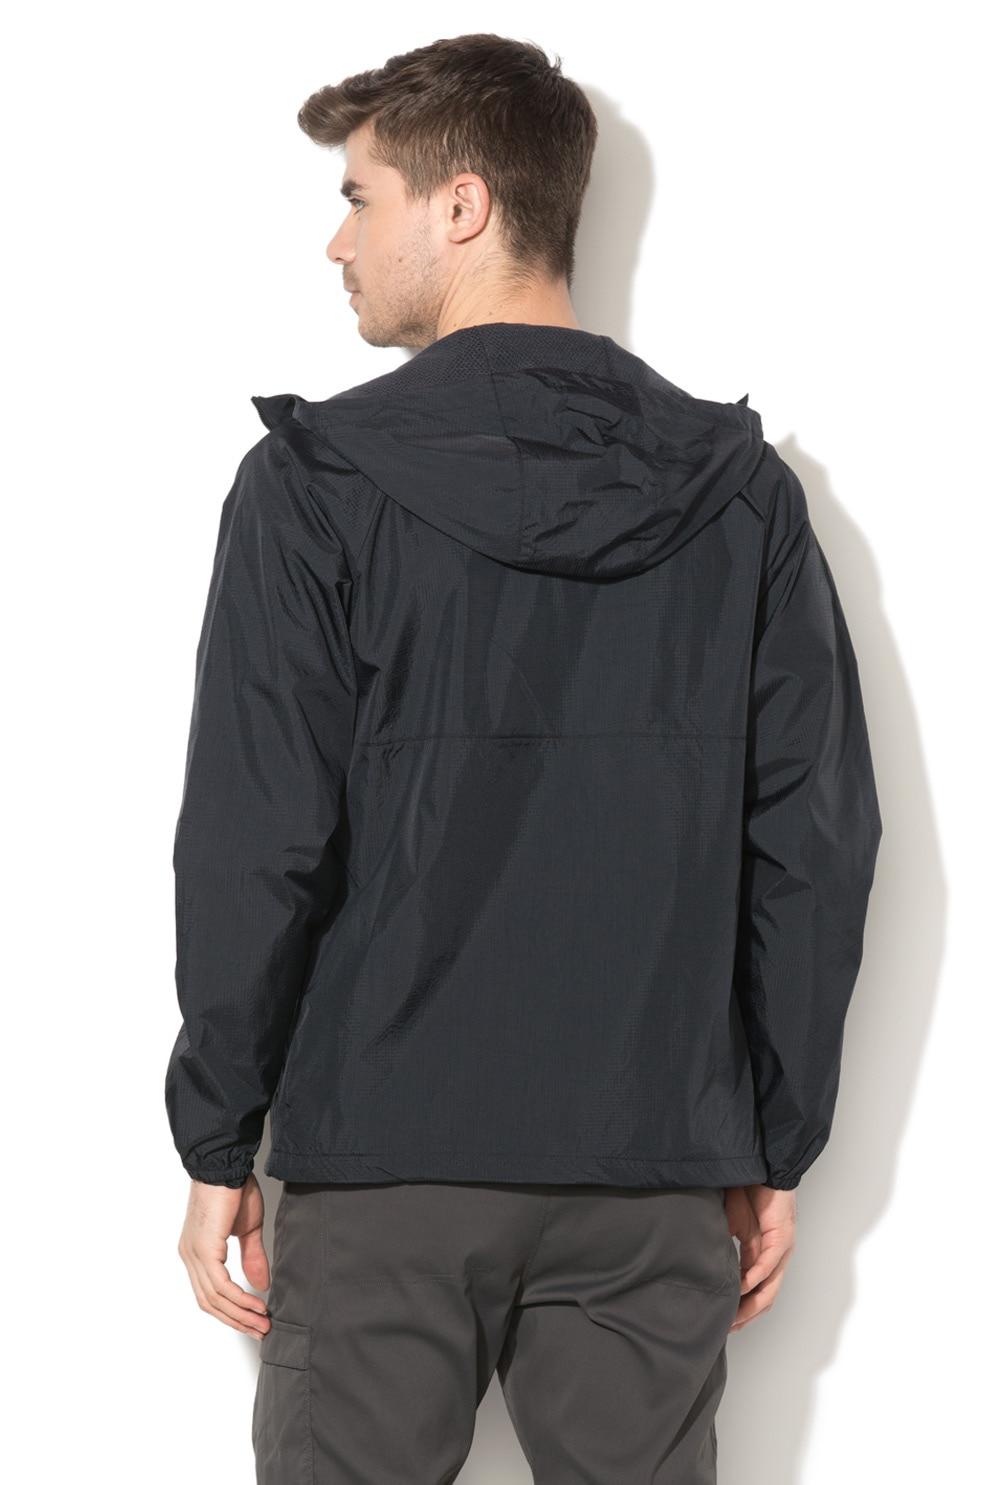 SUPERDRY, Ultimate vízálló kapucnis dzseki, Fekete, L eMAG.hu